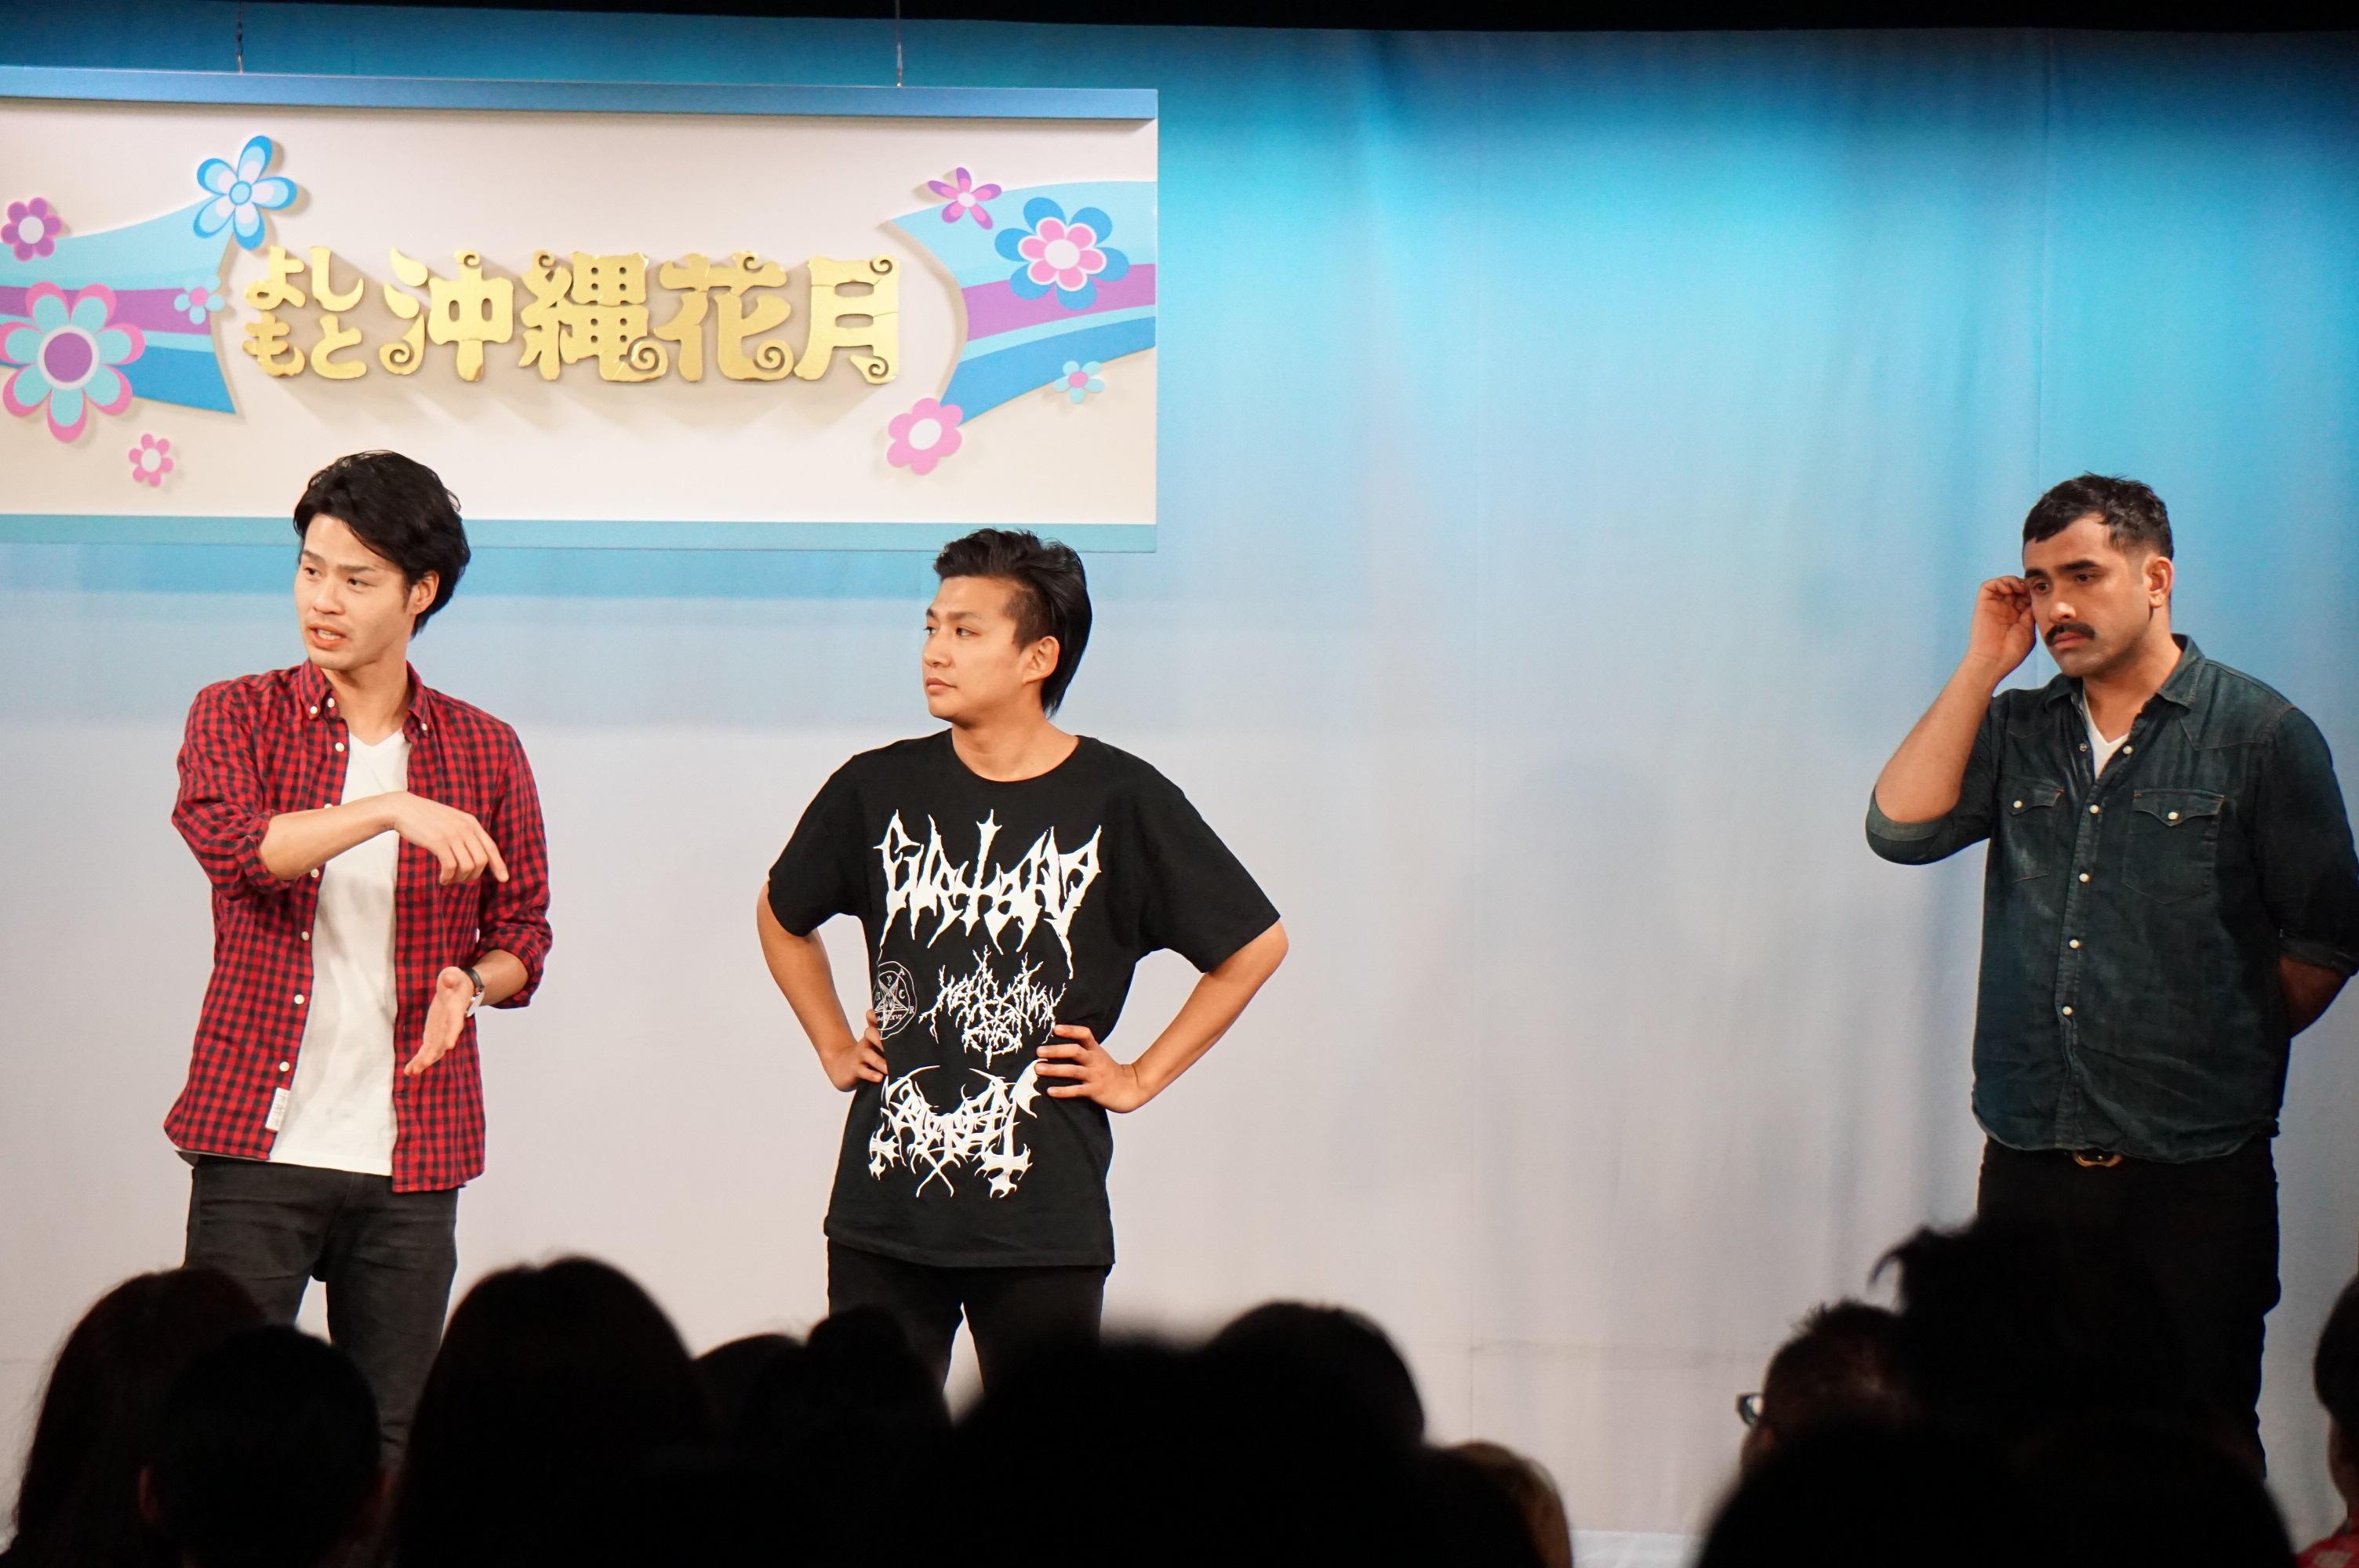 http://news.yoshimoto.co.jp/20151231202453-8b6995da567343cd23e006253f6a515b4e486e89.jpg